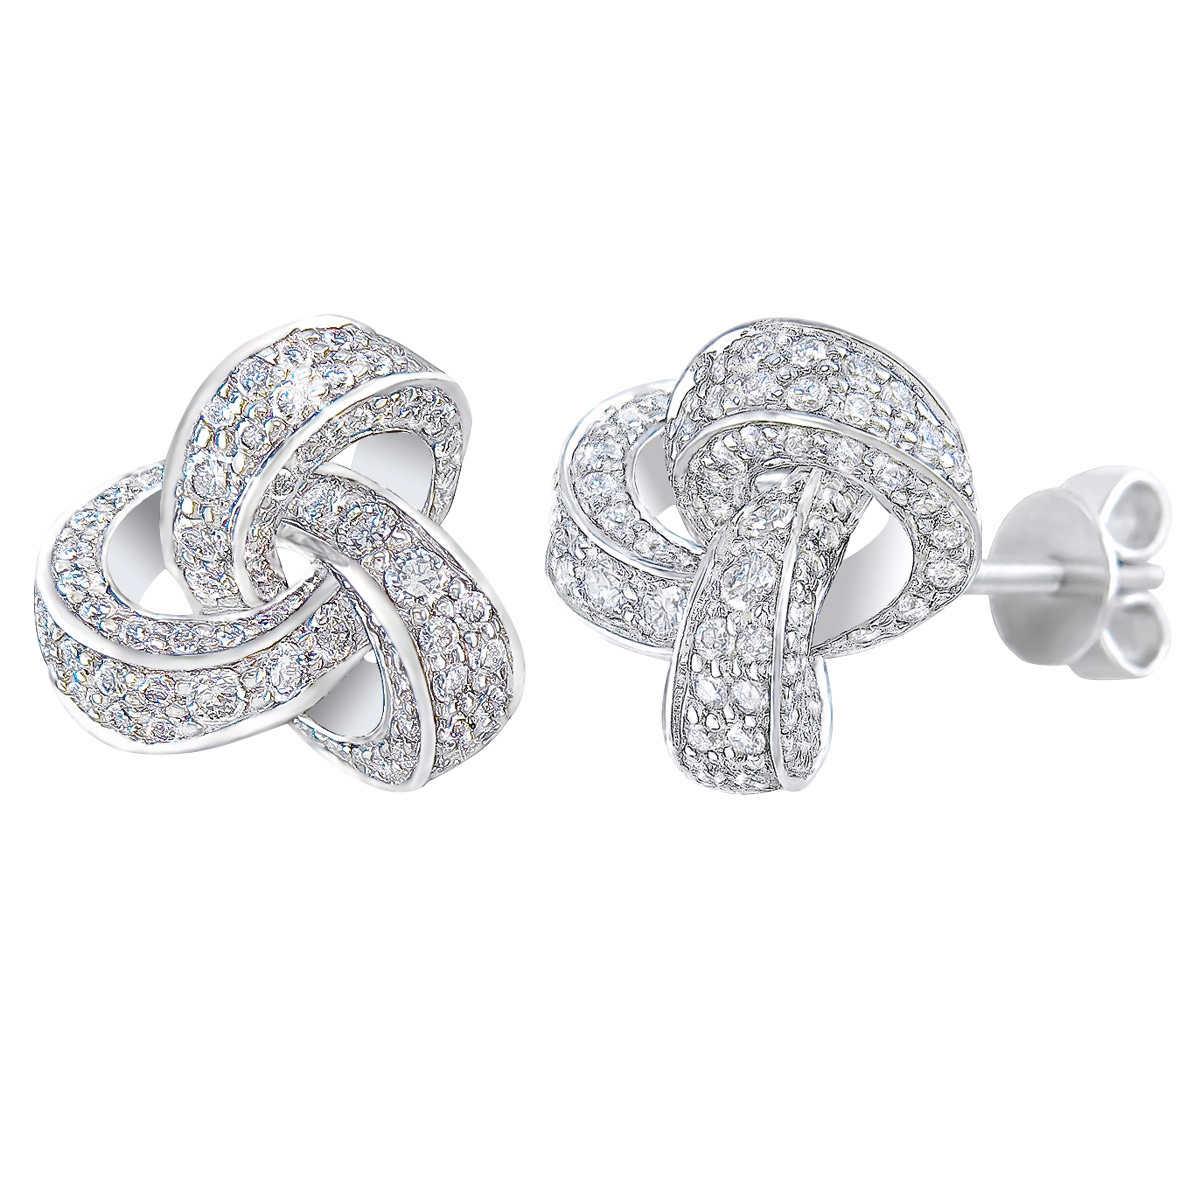 Round Brilliant Diamond Love Knot Earrings (115 Ct)